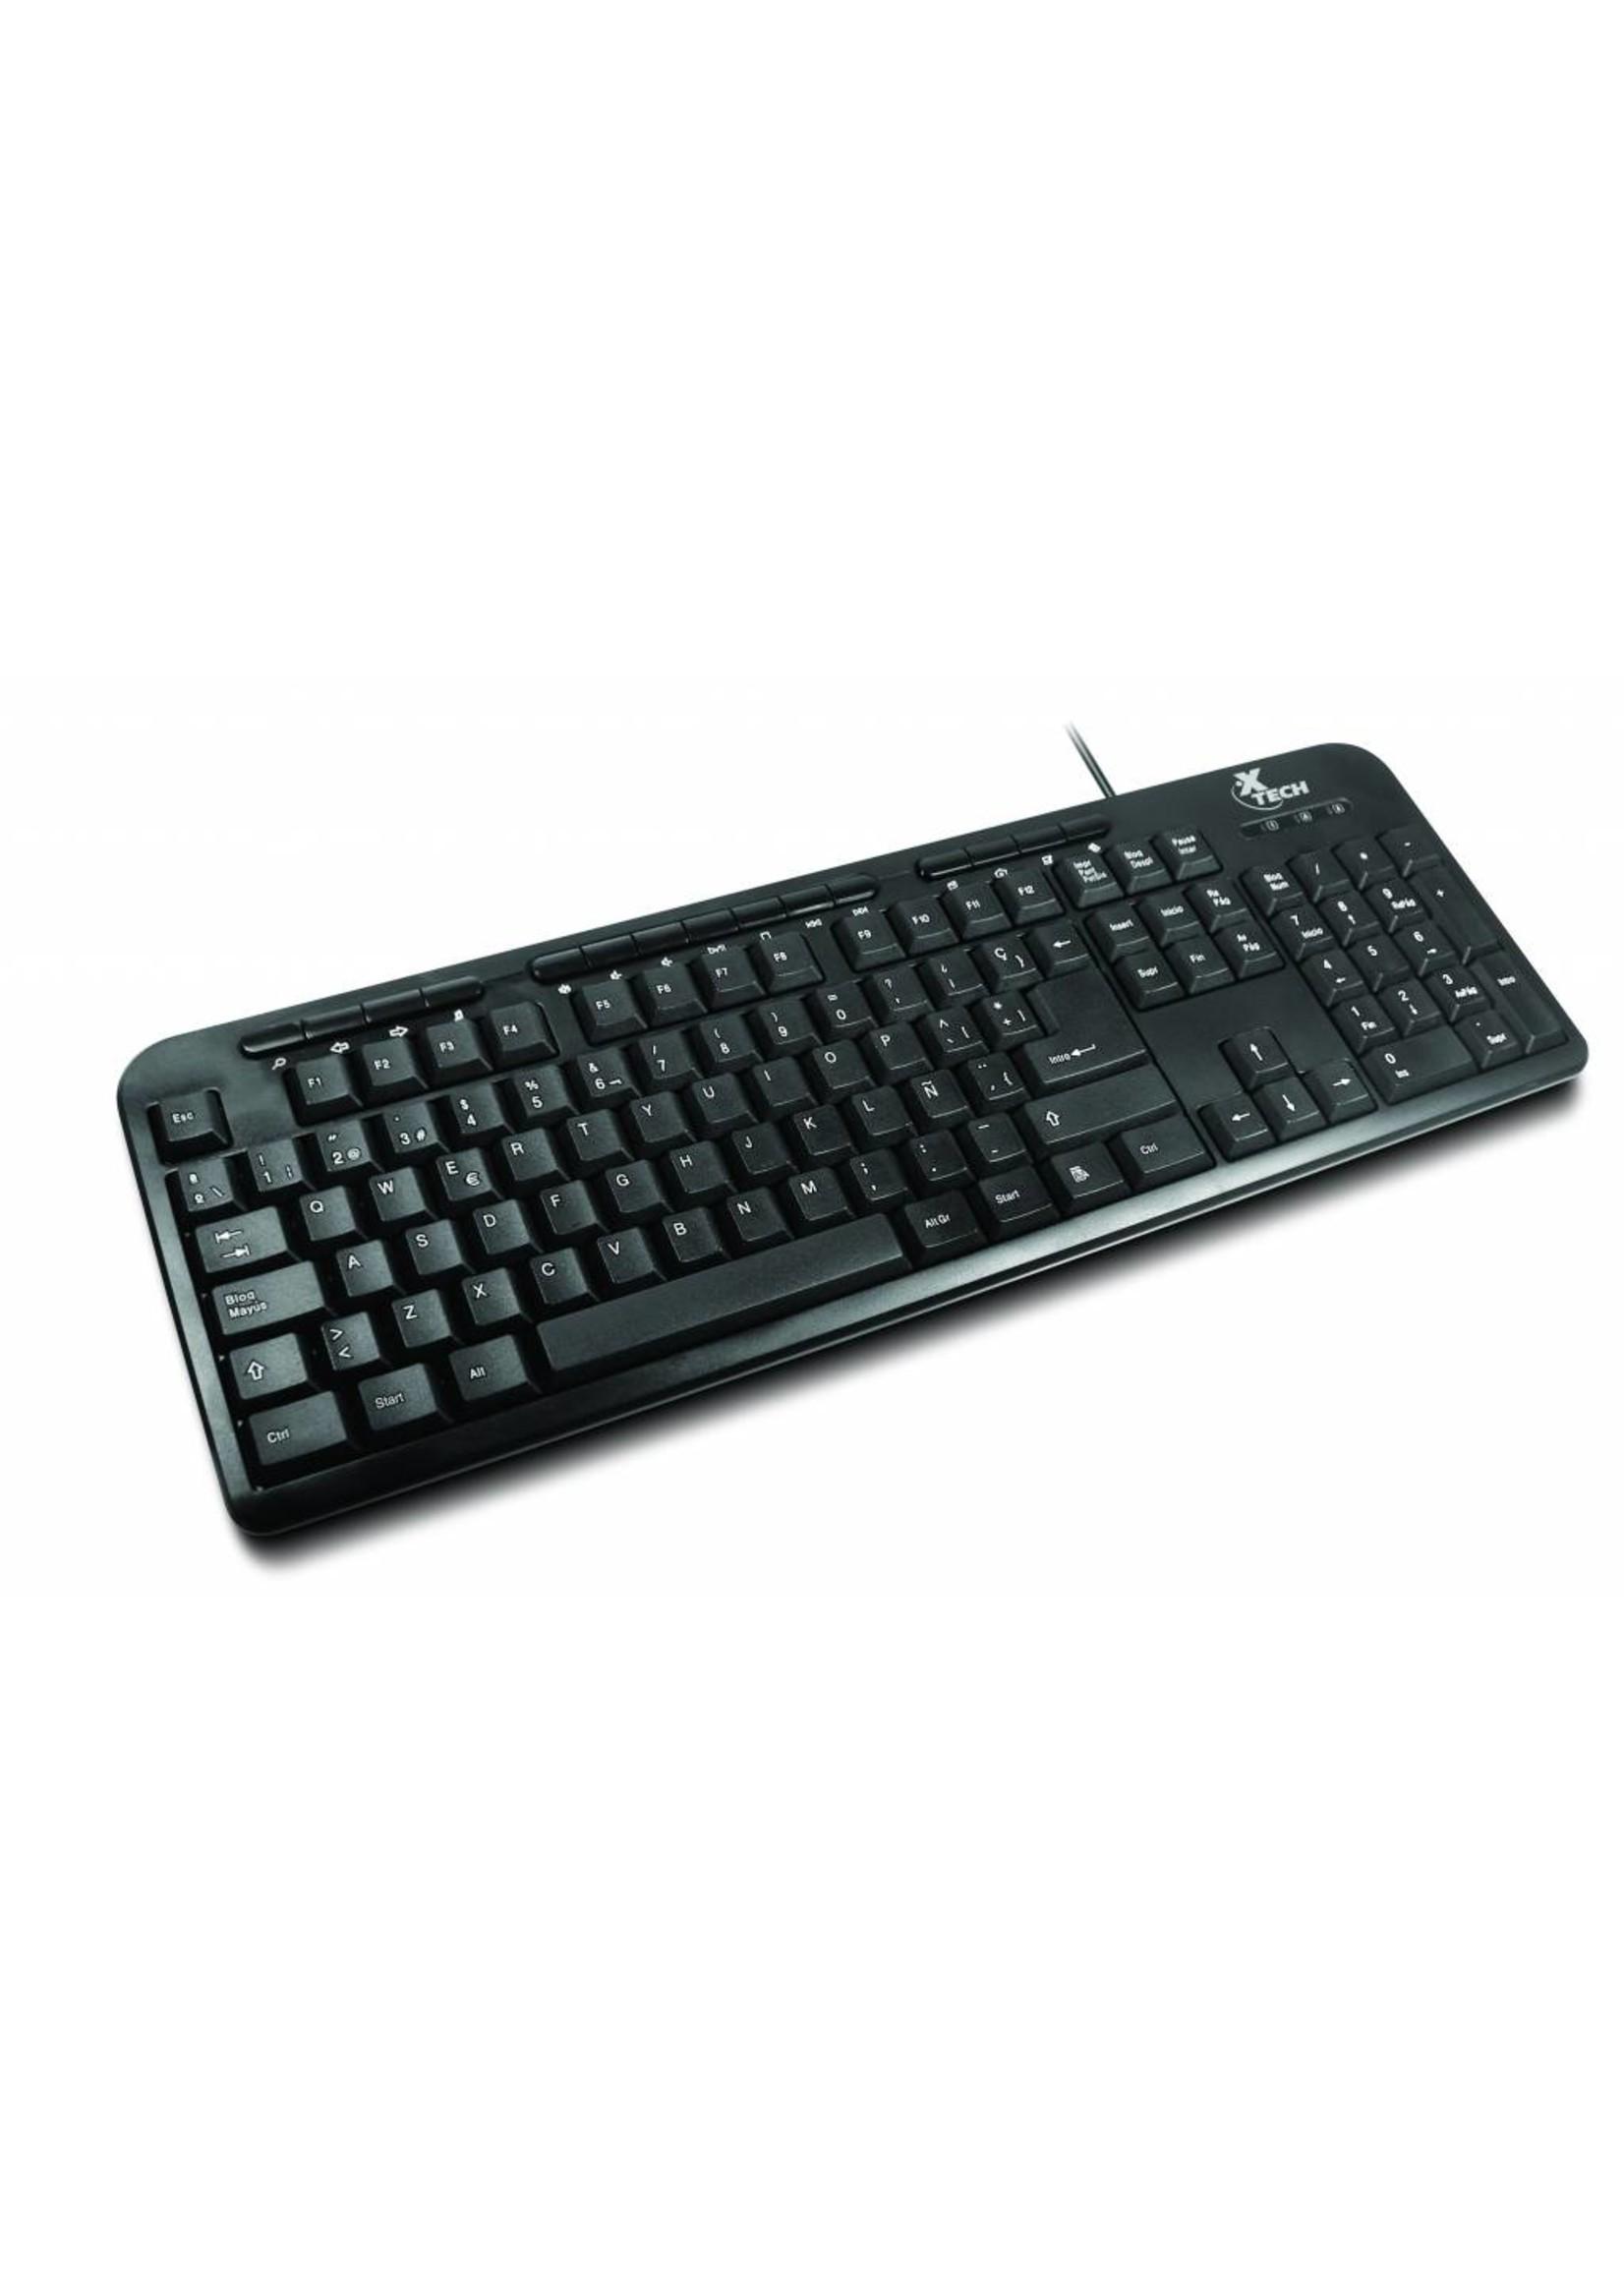 PC USB Keyboard Xtech/Manhattan